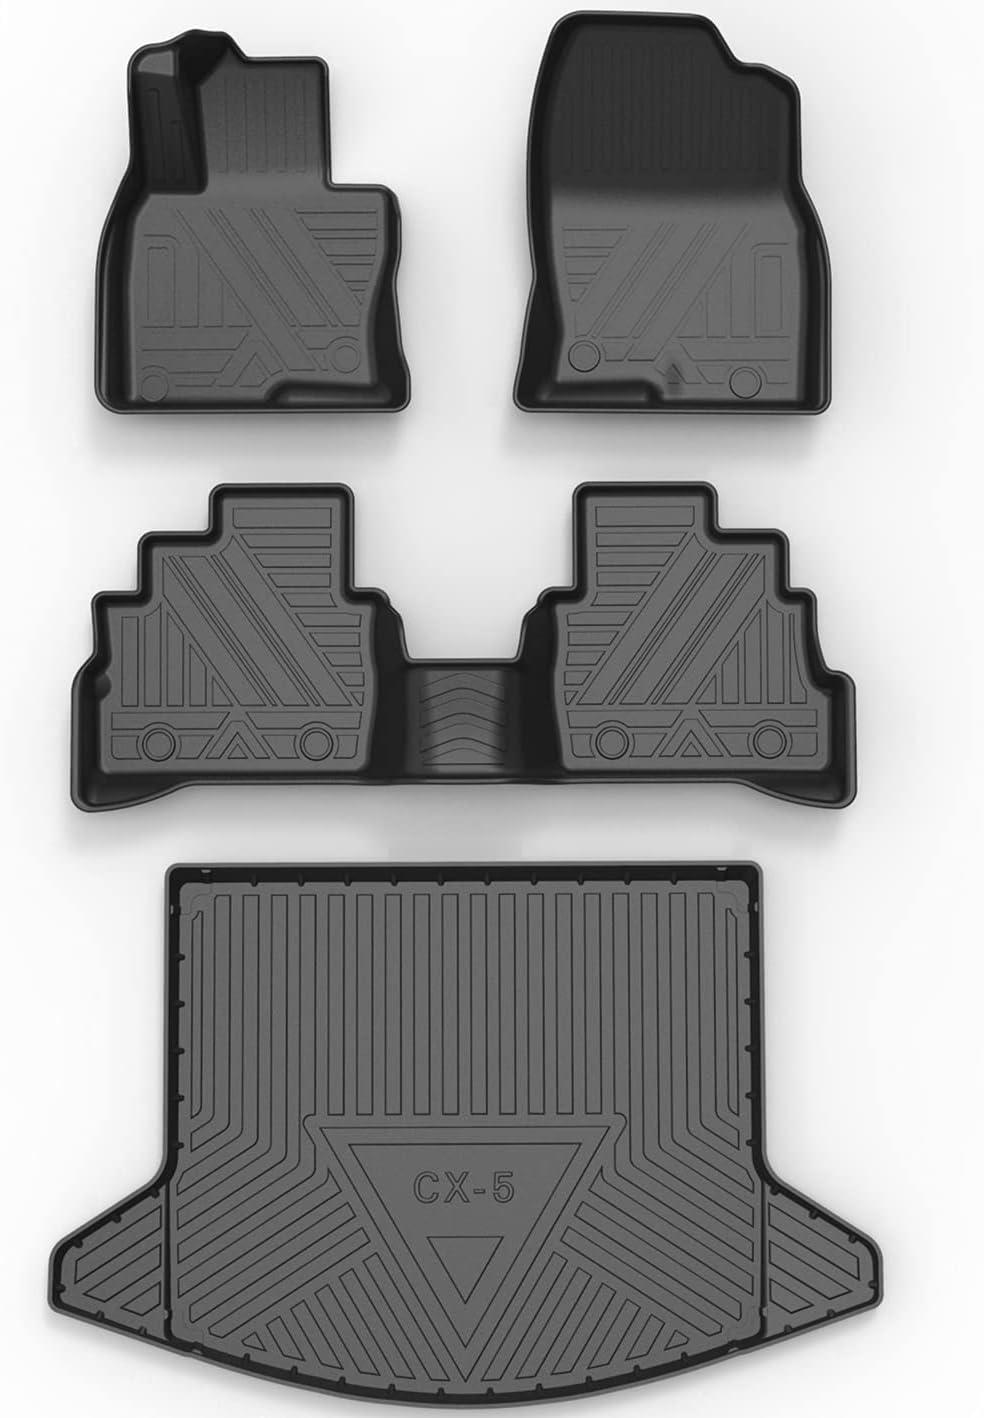 SUPER LINER Floor Mats for 2017-2021 Mazda CX5 - All Weather Custom Fit Mazda CX-5 Car Floor Mats Cargo Liner Rear Cargo Tray Trunk Waterproof Interior Accessories